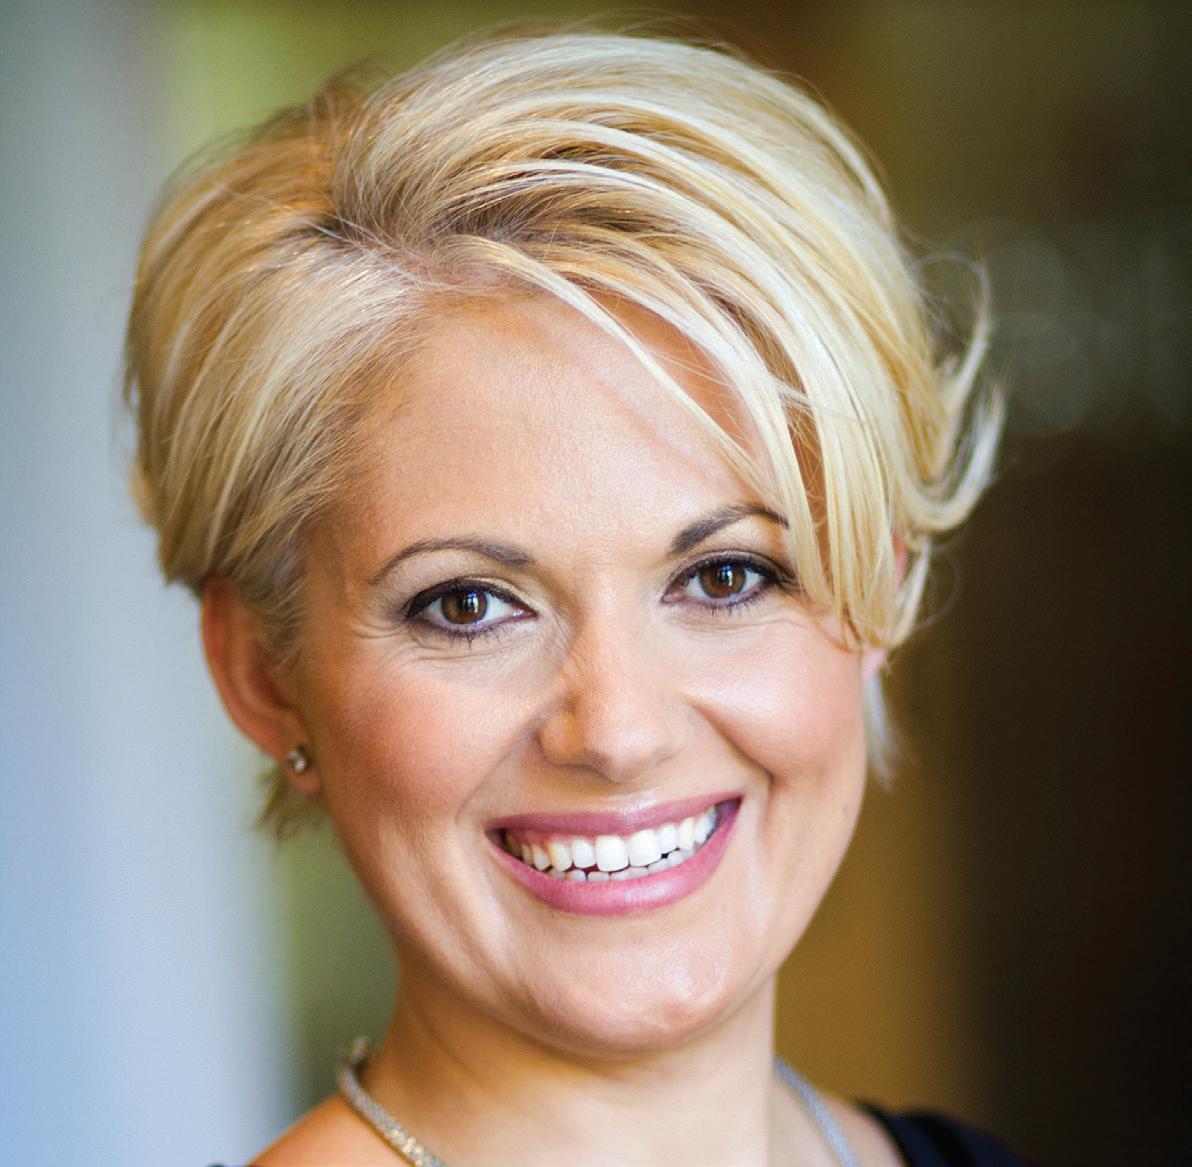 Mary Sartinas, Director, Affiliate Finance & Property